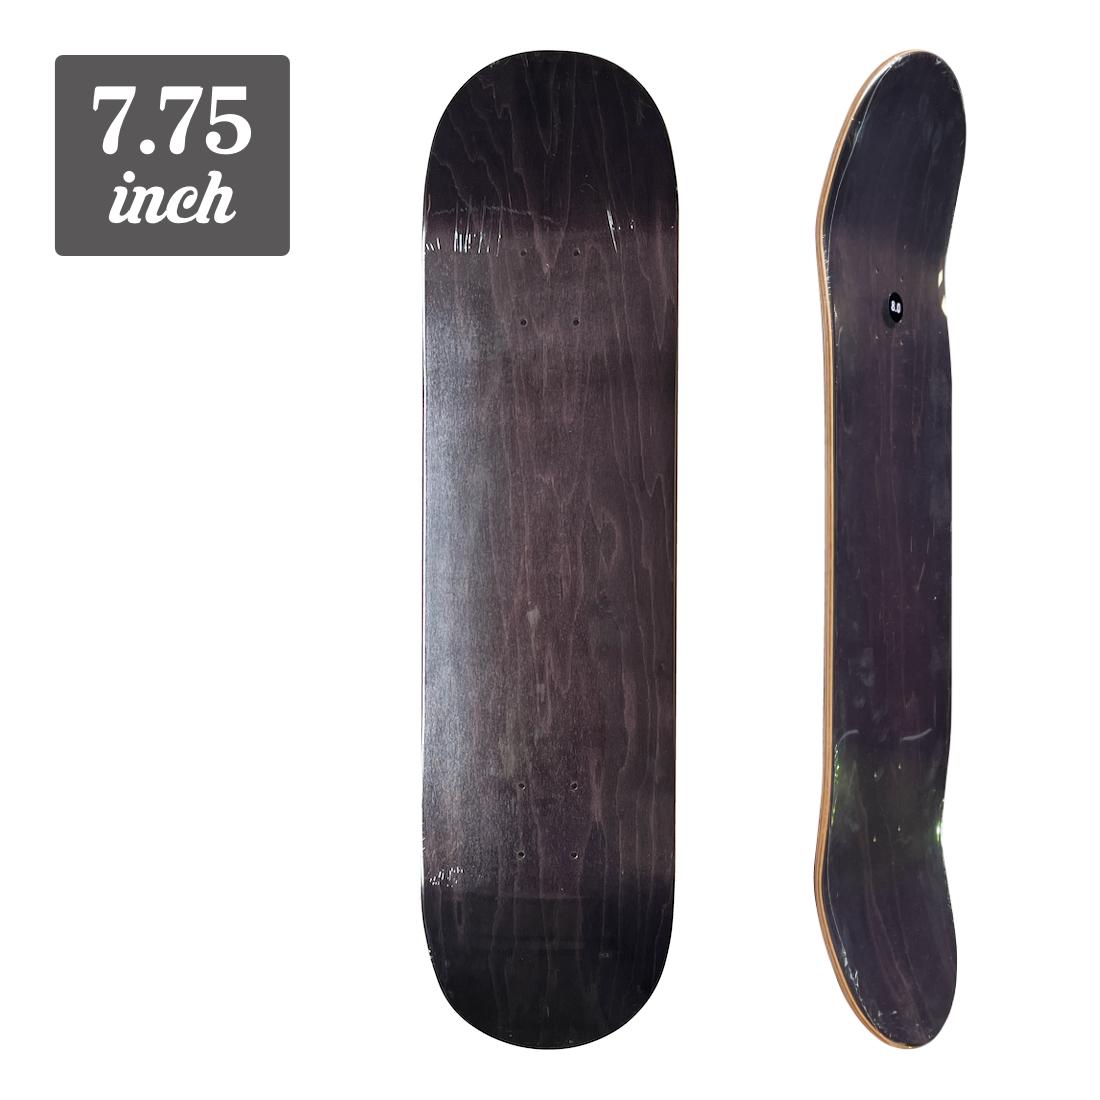 【7.75】Blank Deck - Black/Black